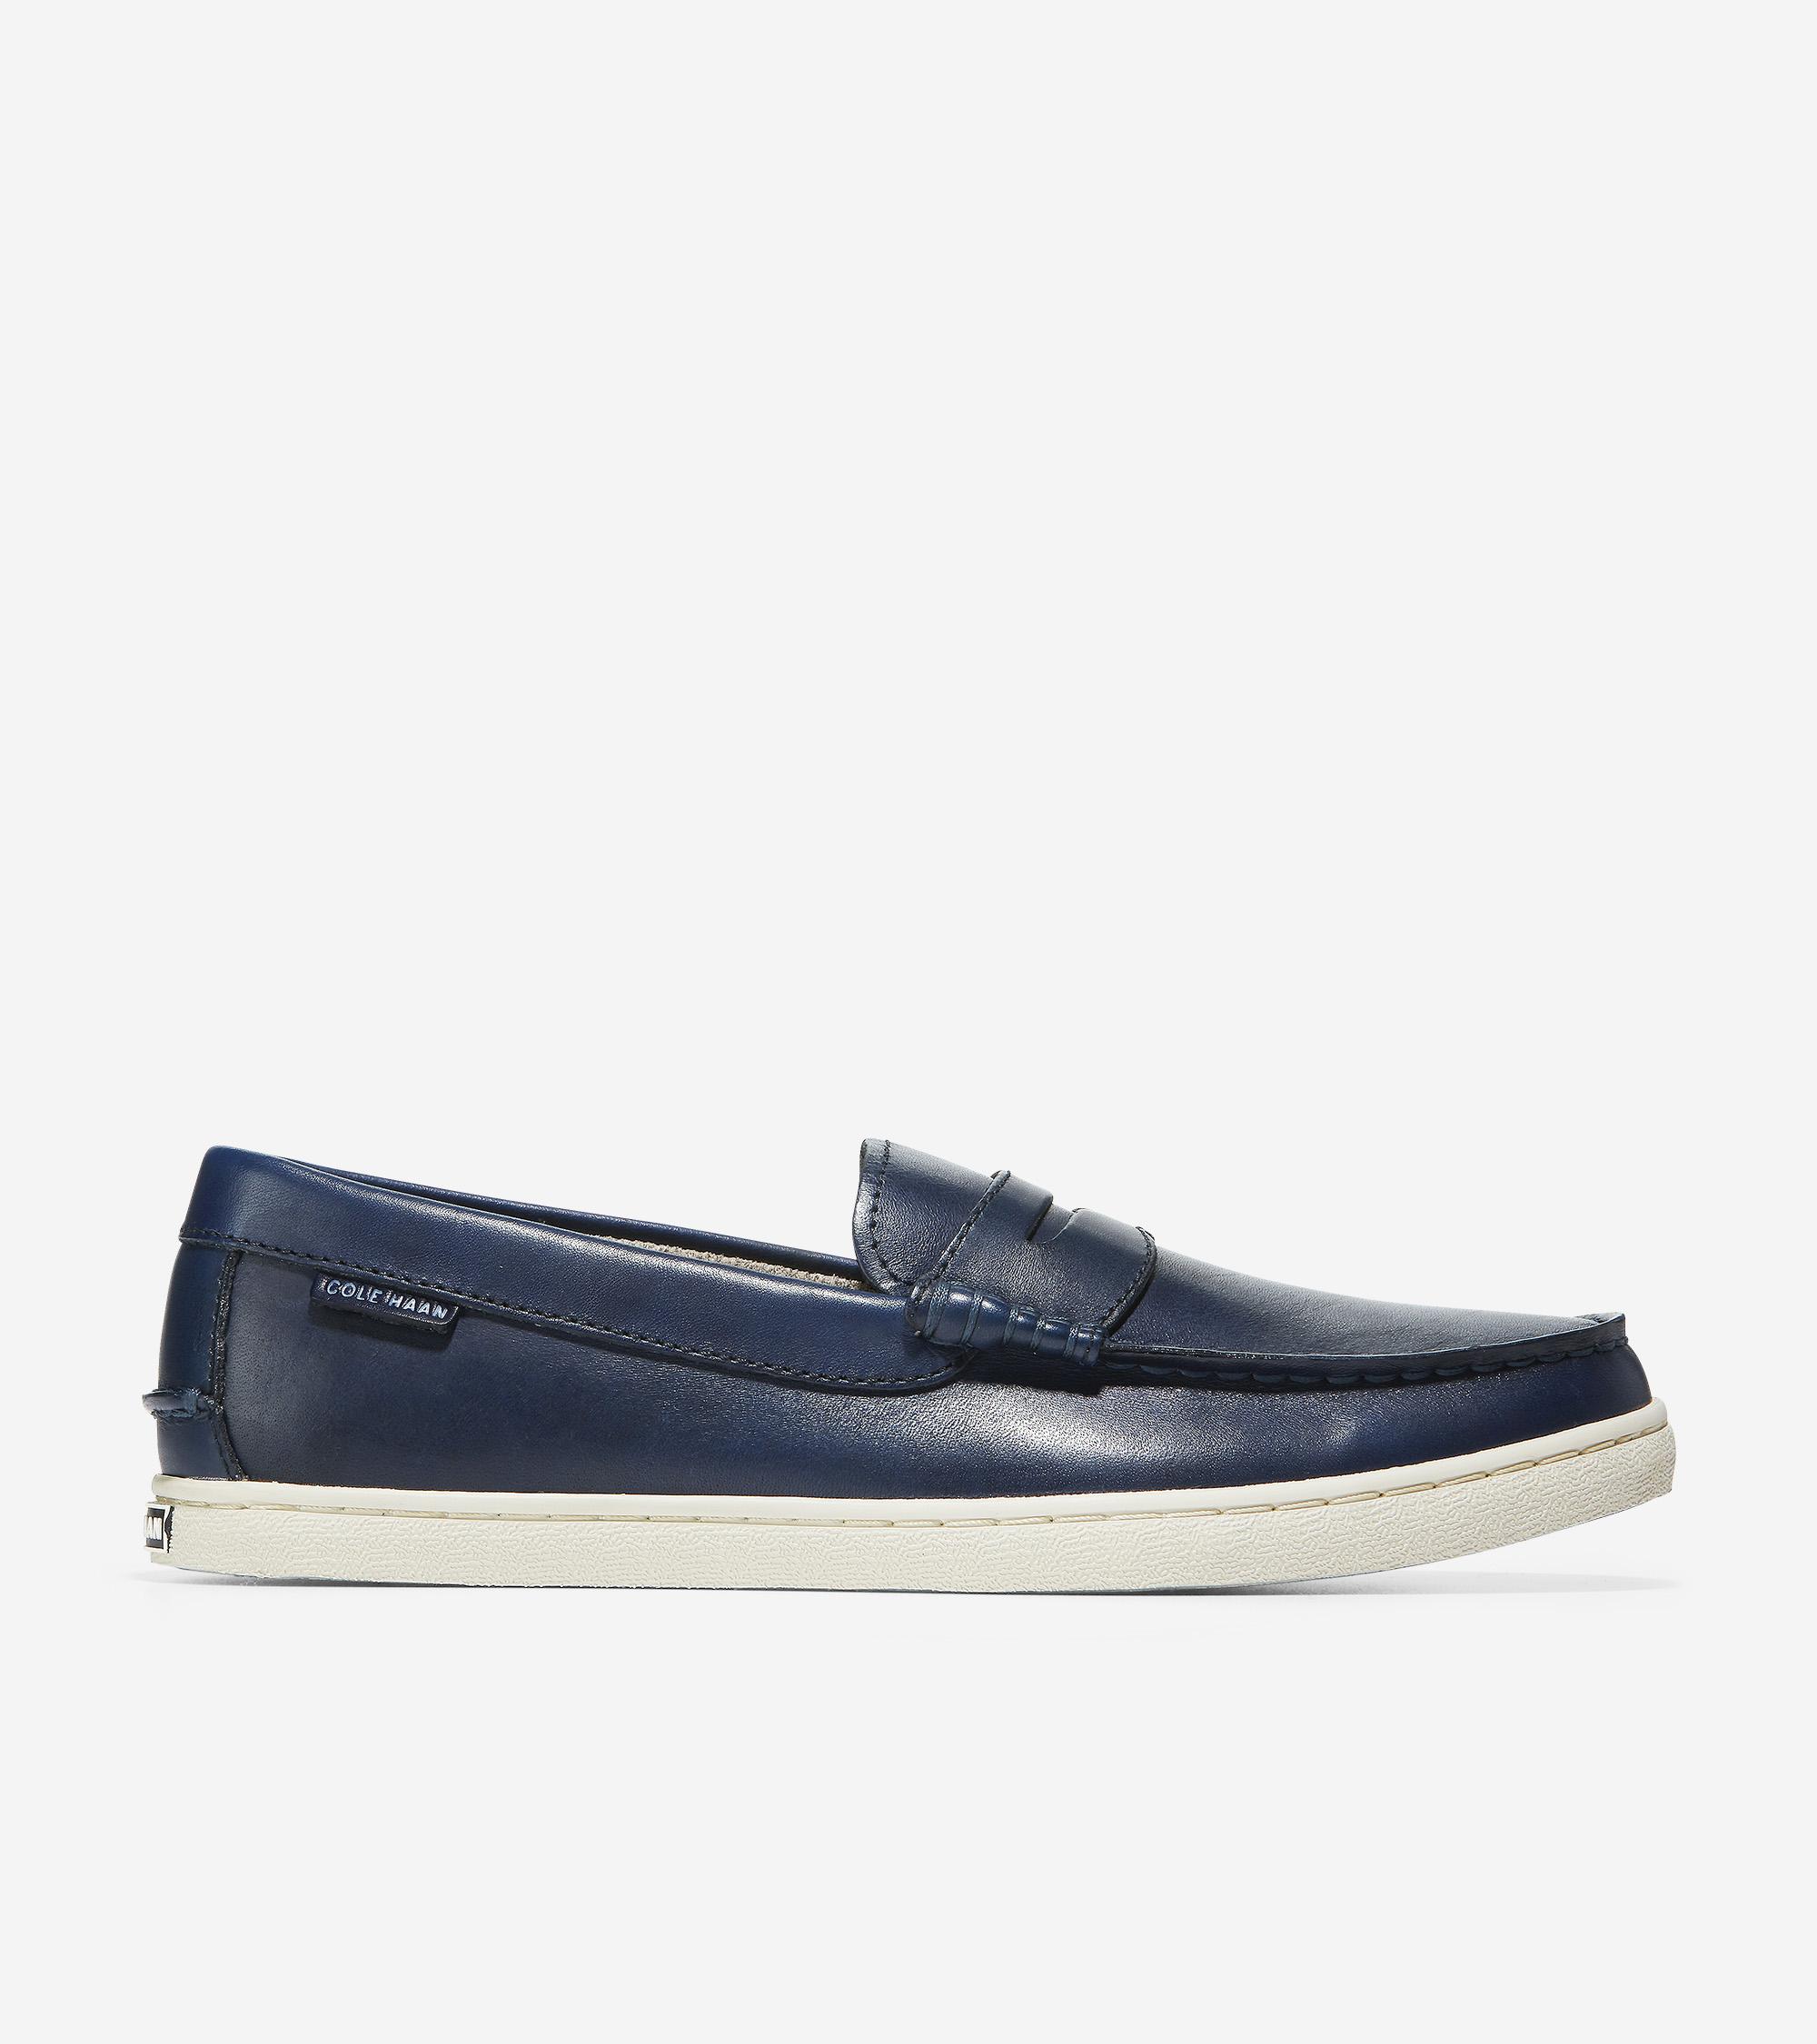 2185931e39e Men's Pinch Weekender Loafer in Blazer Blue Handstain | Cole Haan US